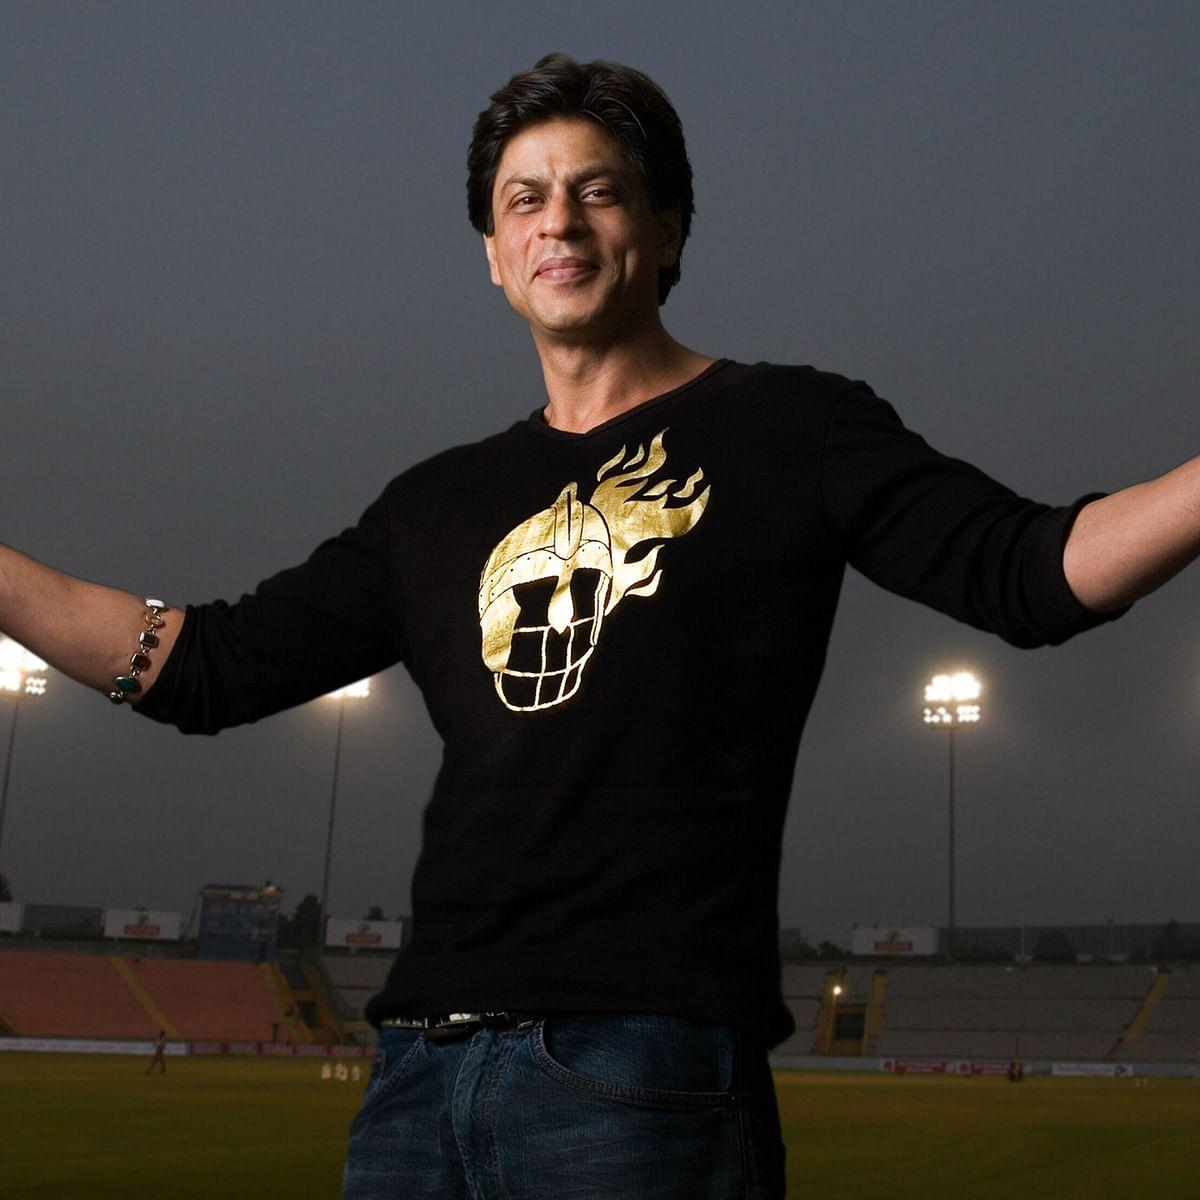 سپر اسٹار شاہ رخ خان / Getty Images